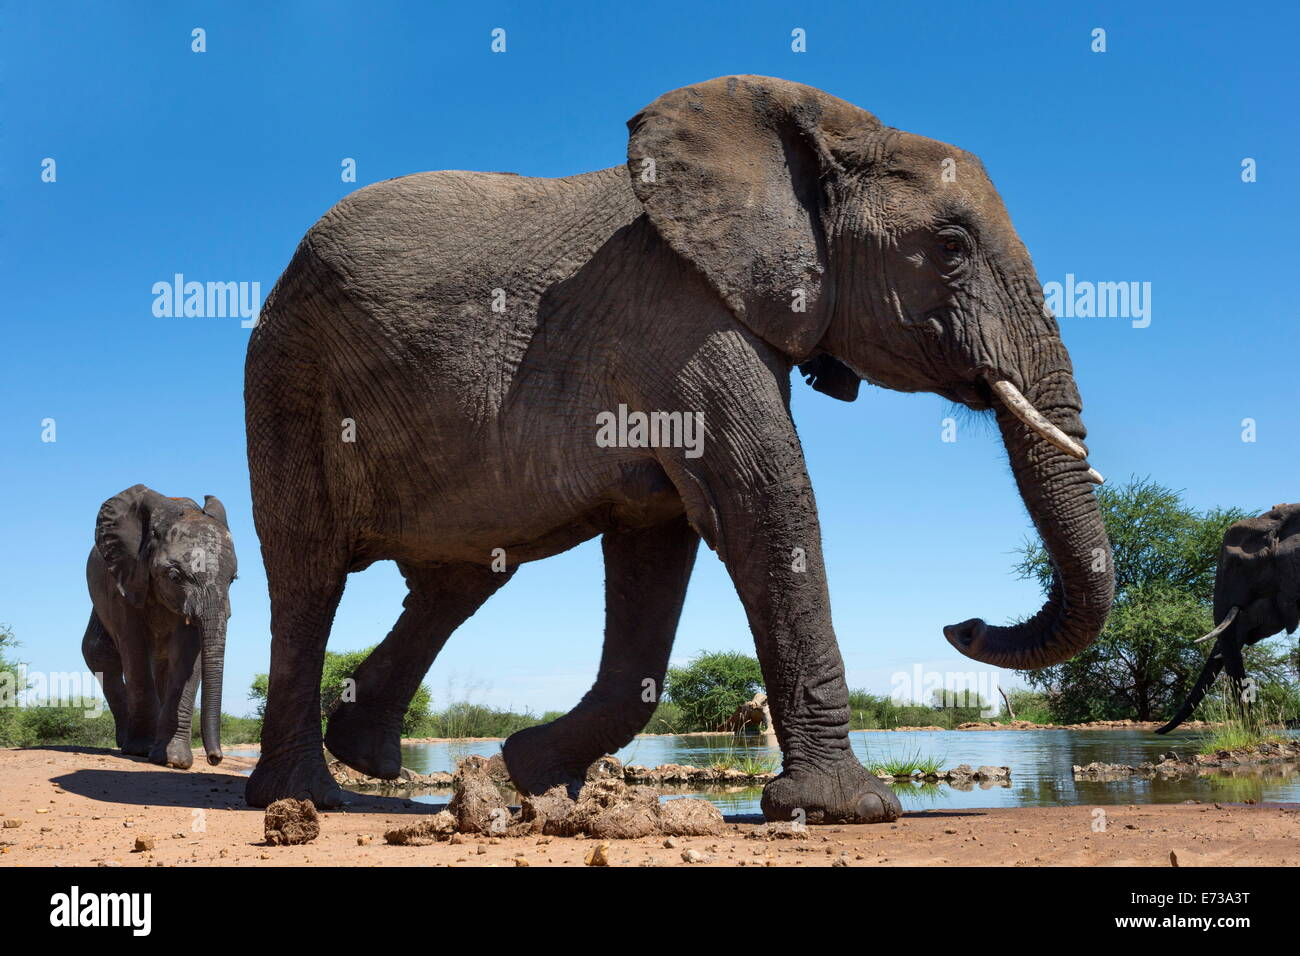 El elefante africano (Loxodonta africana) en el waterhole, Madikwe Game Reserve, North West Province, Sudáfrica, Imagen De Stock